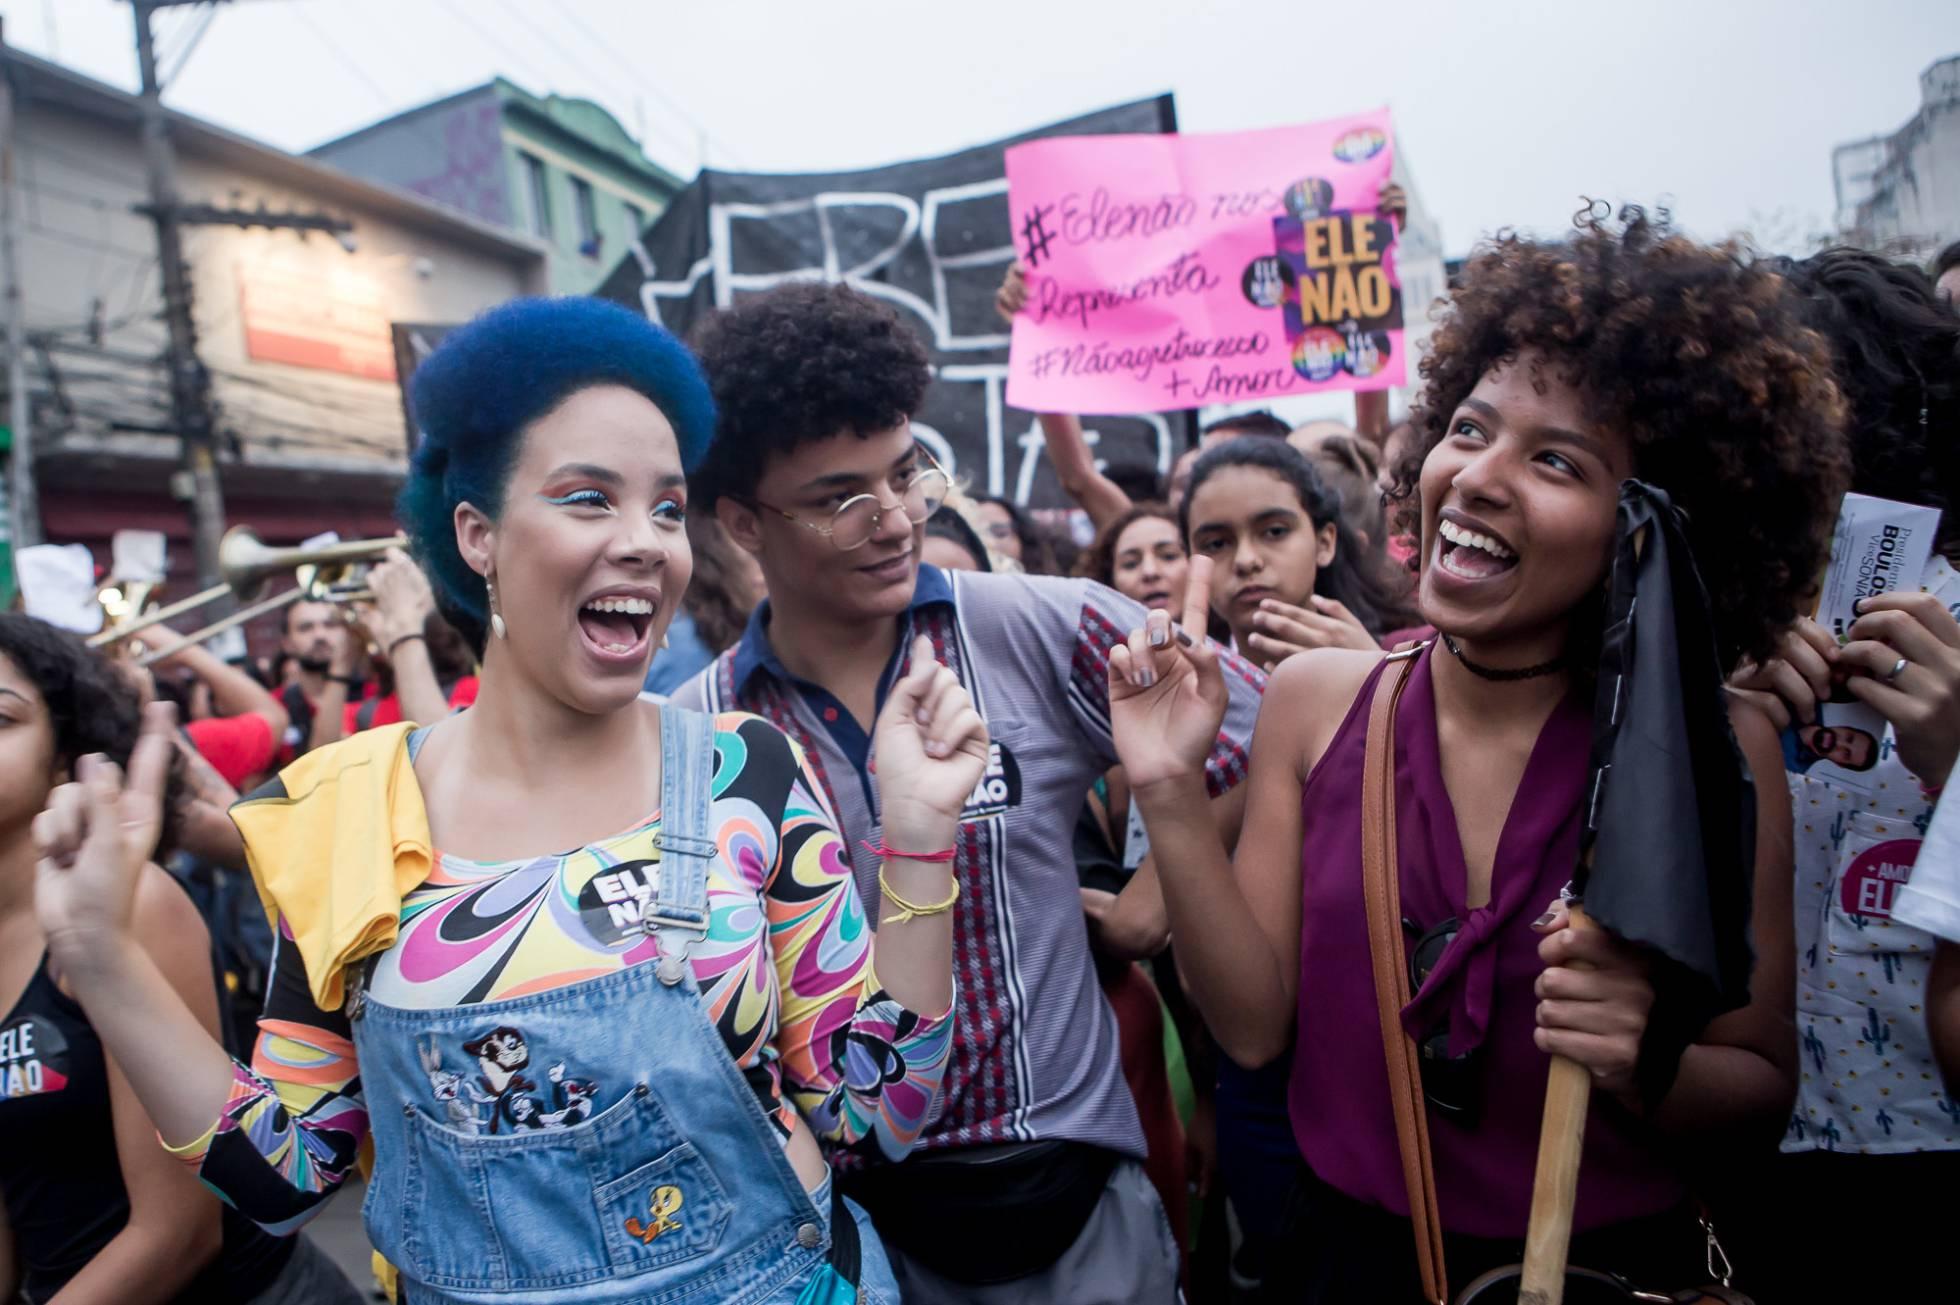 Manifestantes durante o protesto contra Bolsonaro.